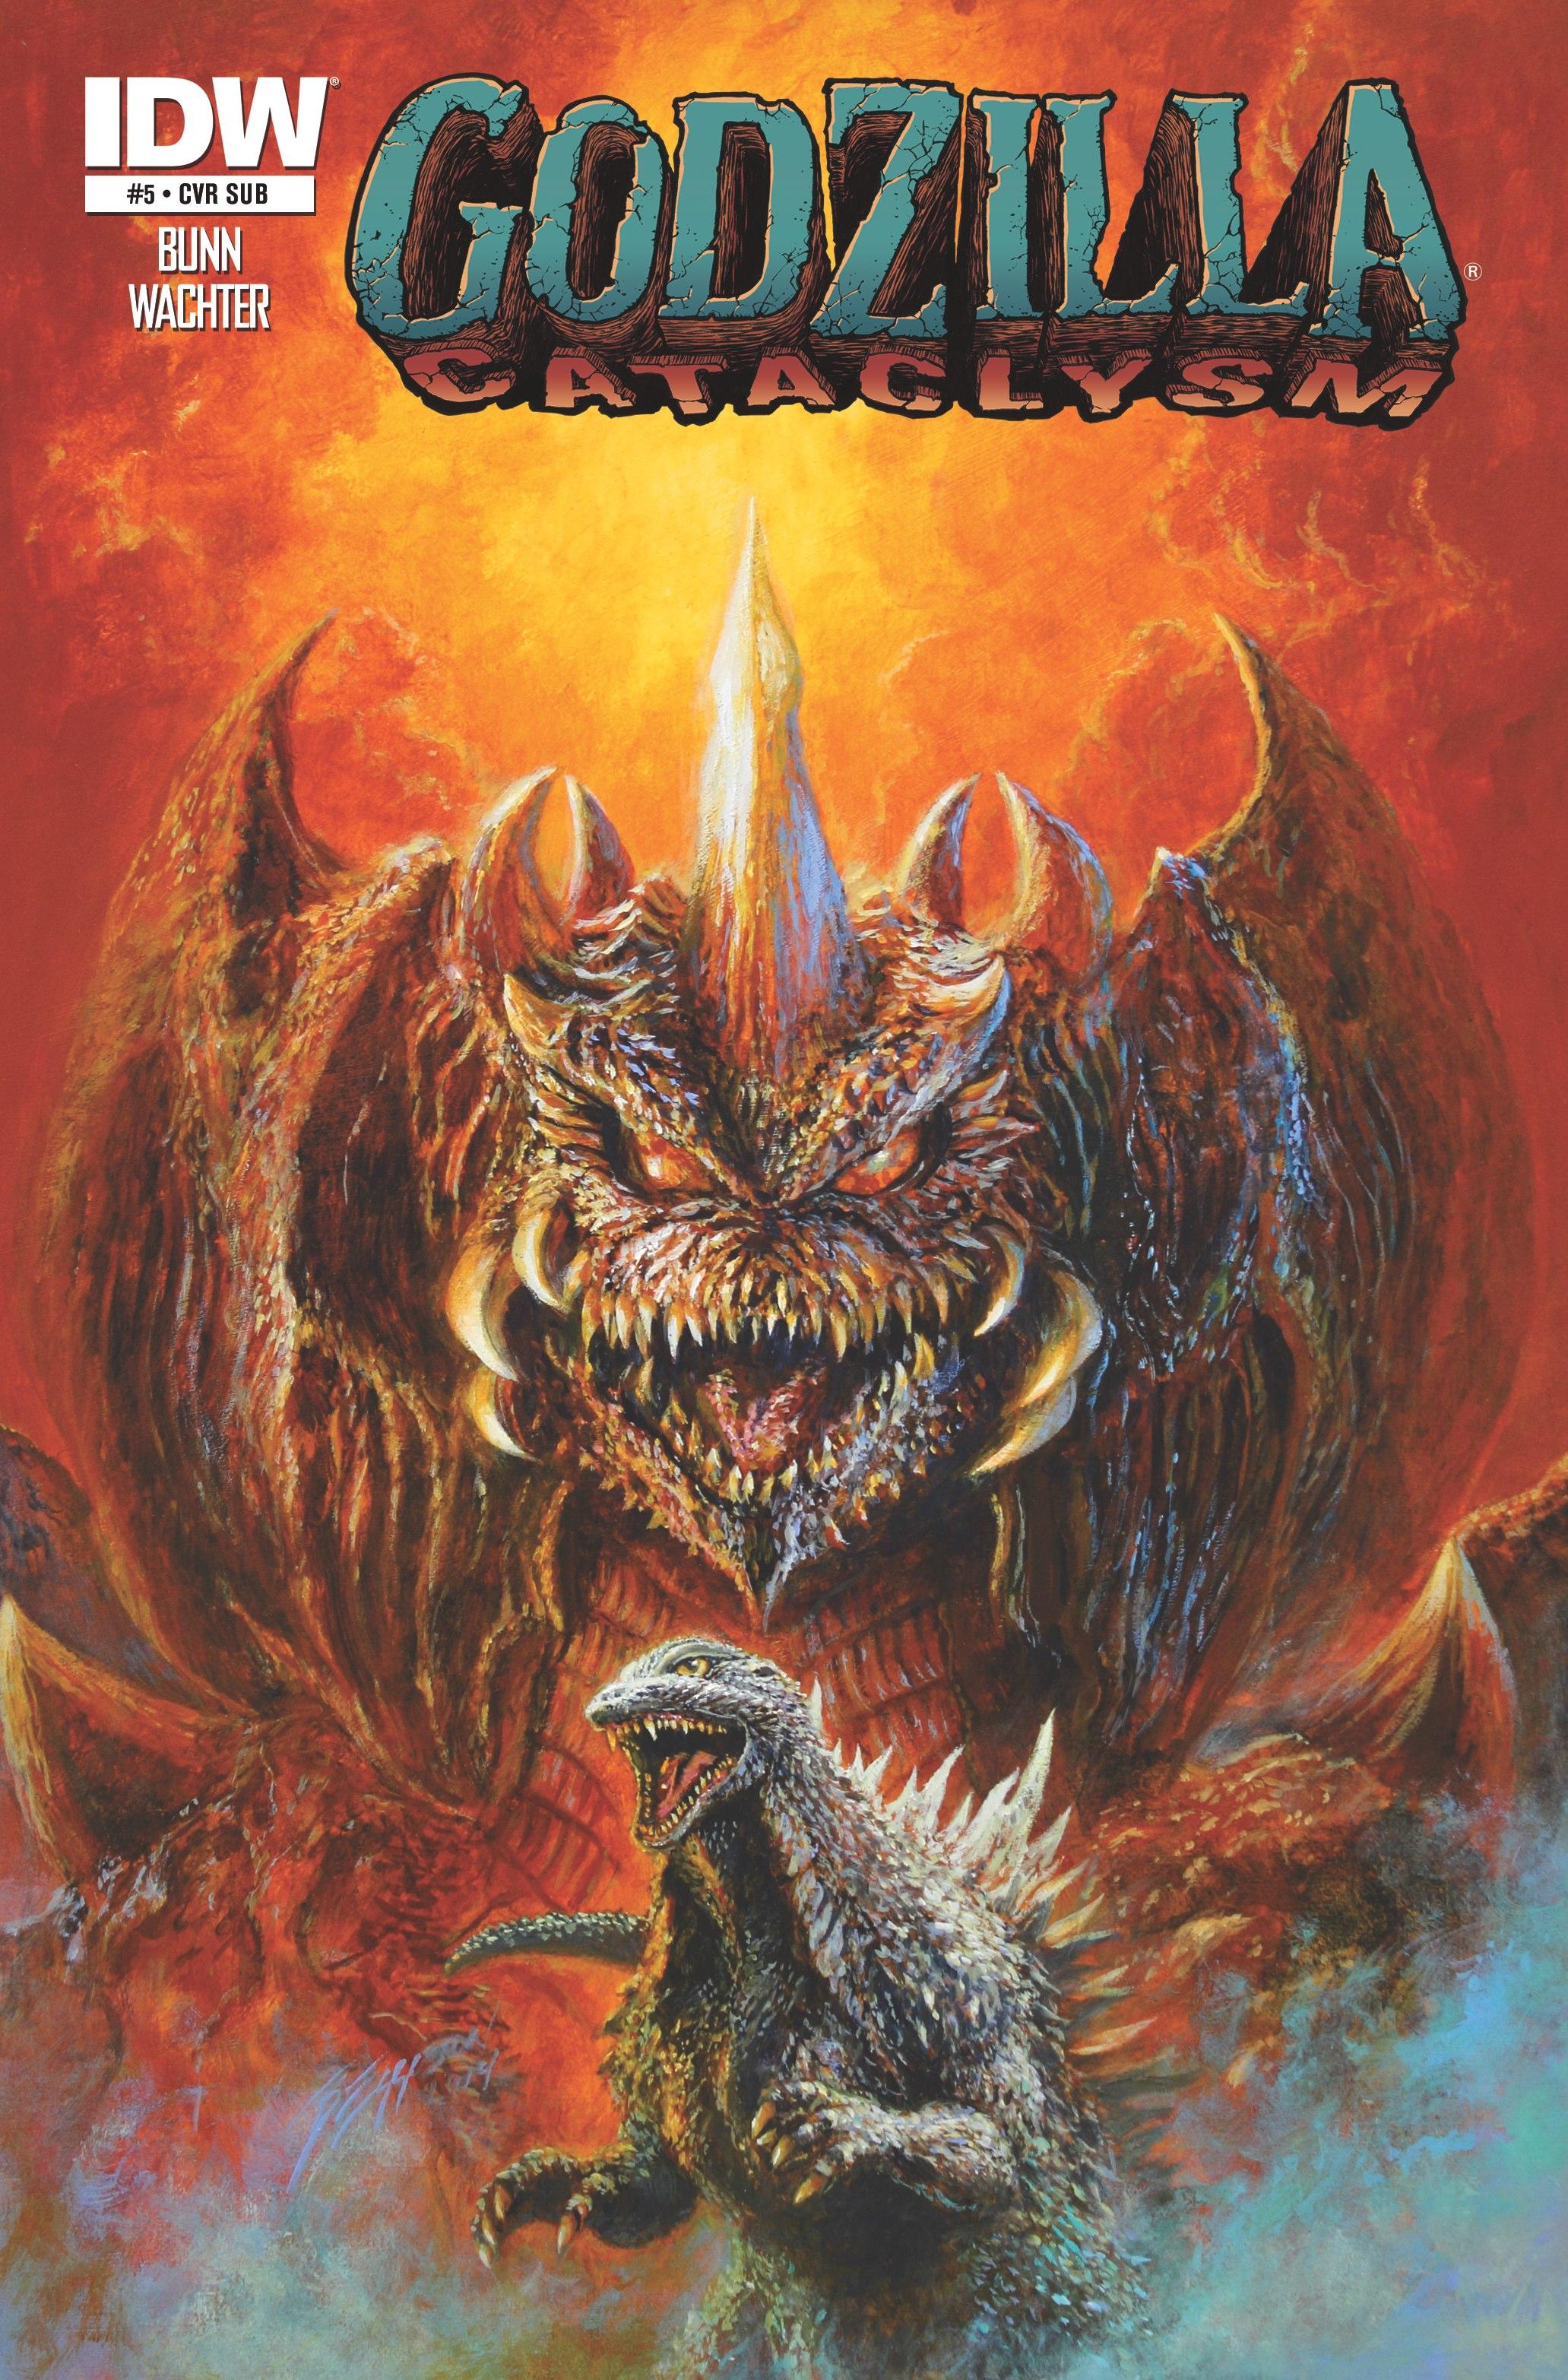 GODZILLA Cataclysm 5 Review  Unleash The Fanboy